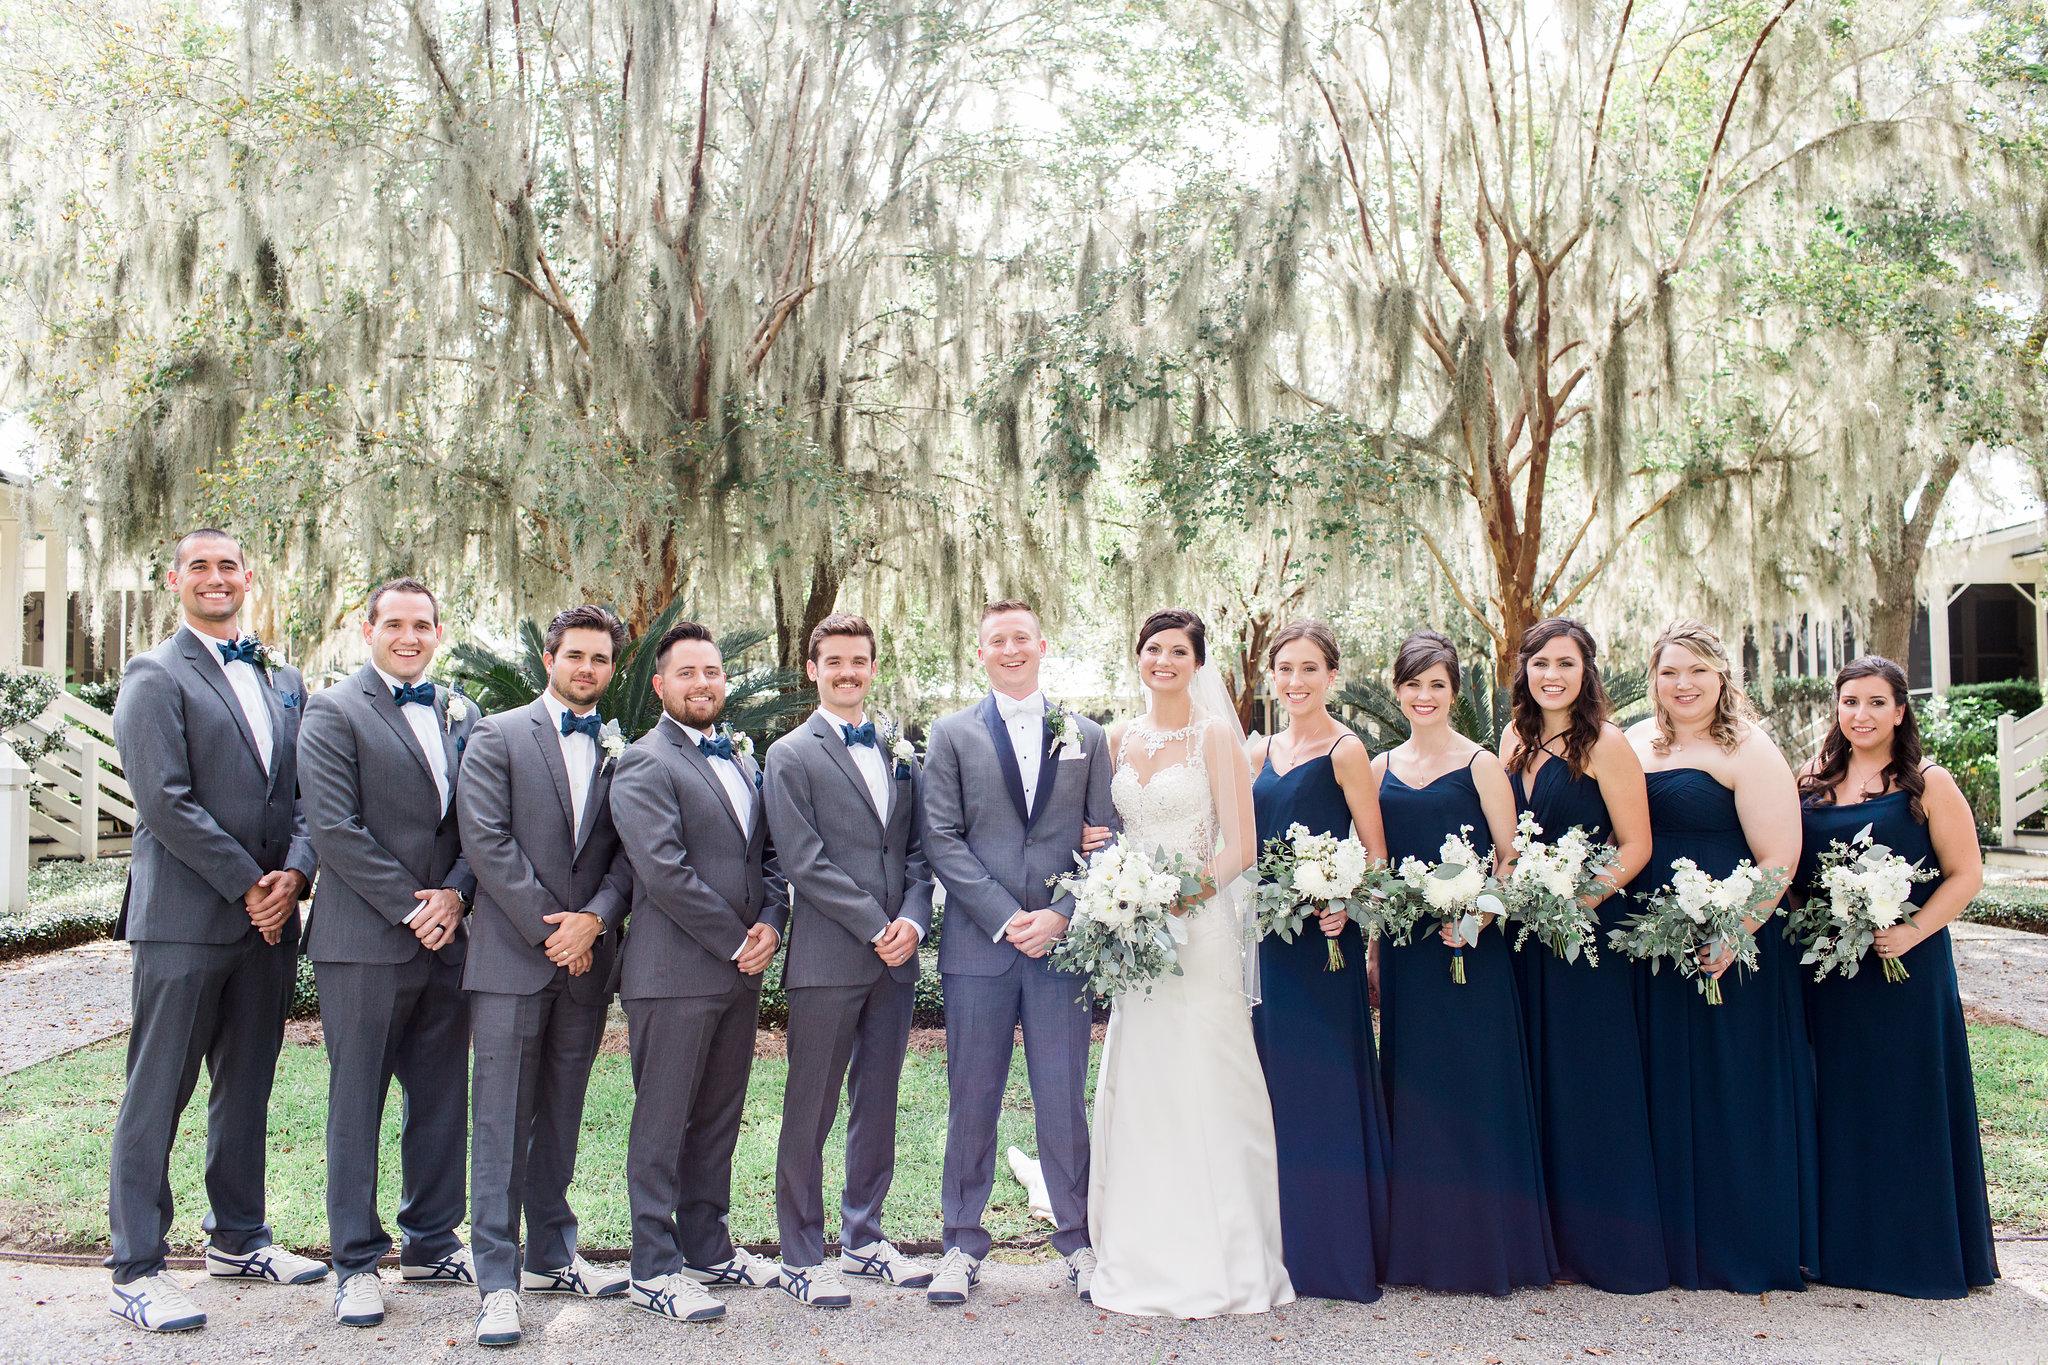 apt-b-photography-lauren-graham-oldfield-wedding-south-carolina-wedding-photographer-savannah-wedding-lowcountry-wedding-coastal-wedding-navy-bridesmaids-grey-groomsmen-21.JPG